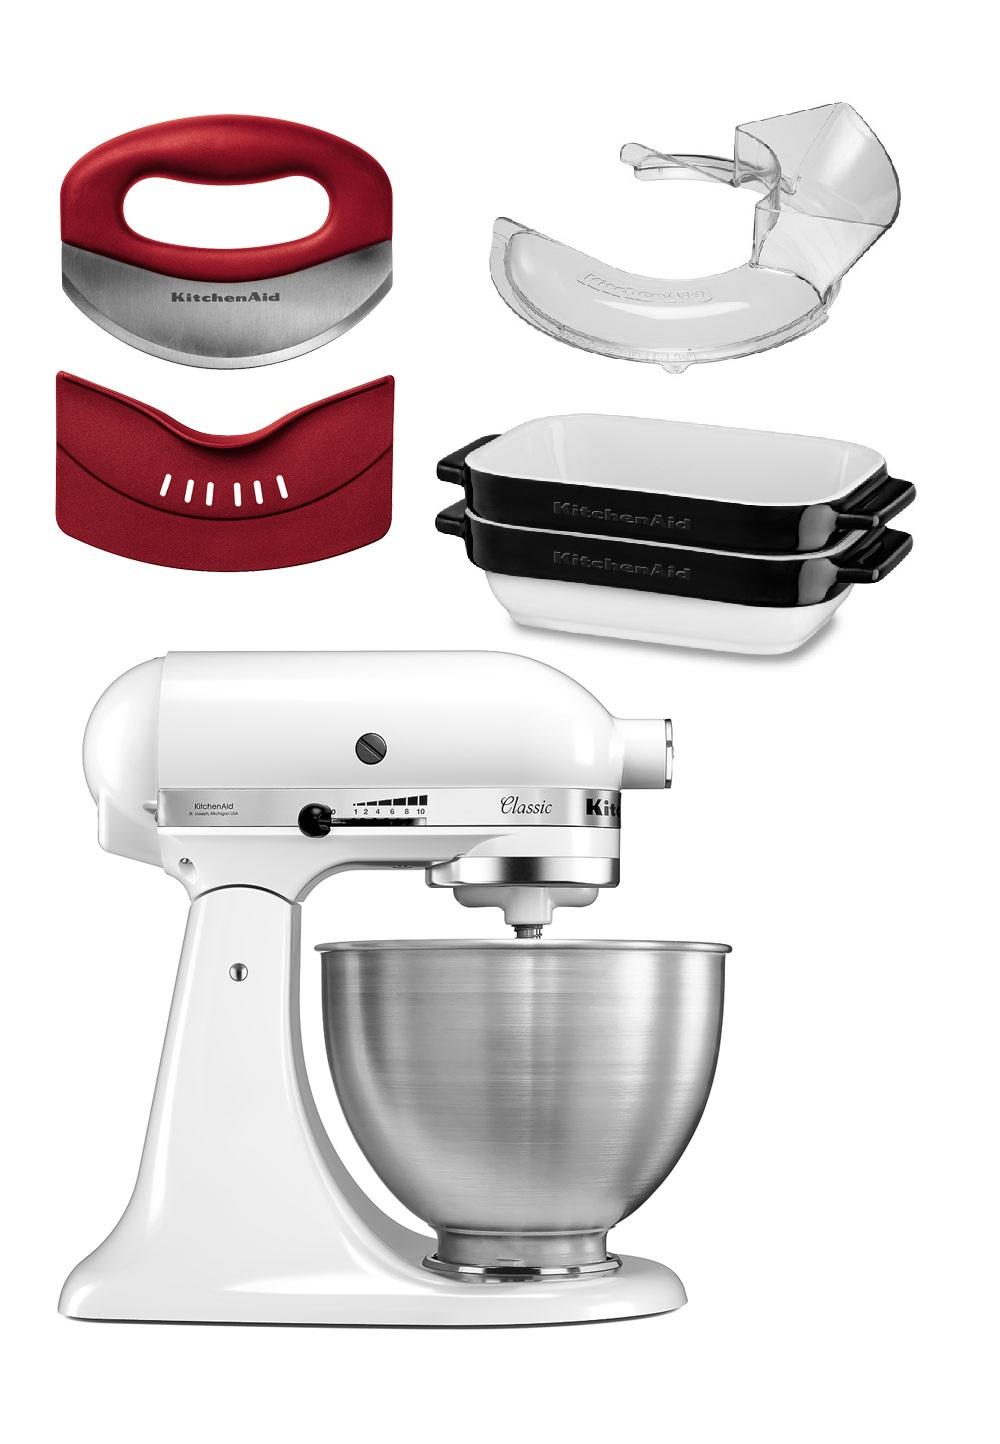 Kitchenaid Classic Küchenmaschine 5K45SS + Gemüse Set + Mini Bäcker Set + Spritzschutz [brands4friends], ggf. 15 € Neukunden-Bonus, 4 % Shoop